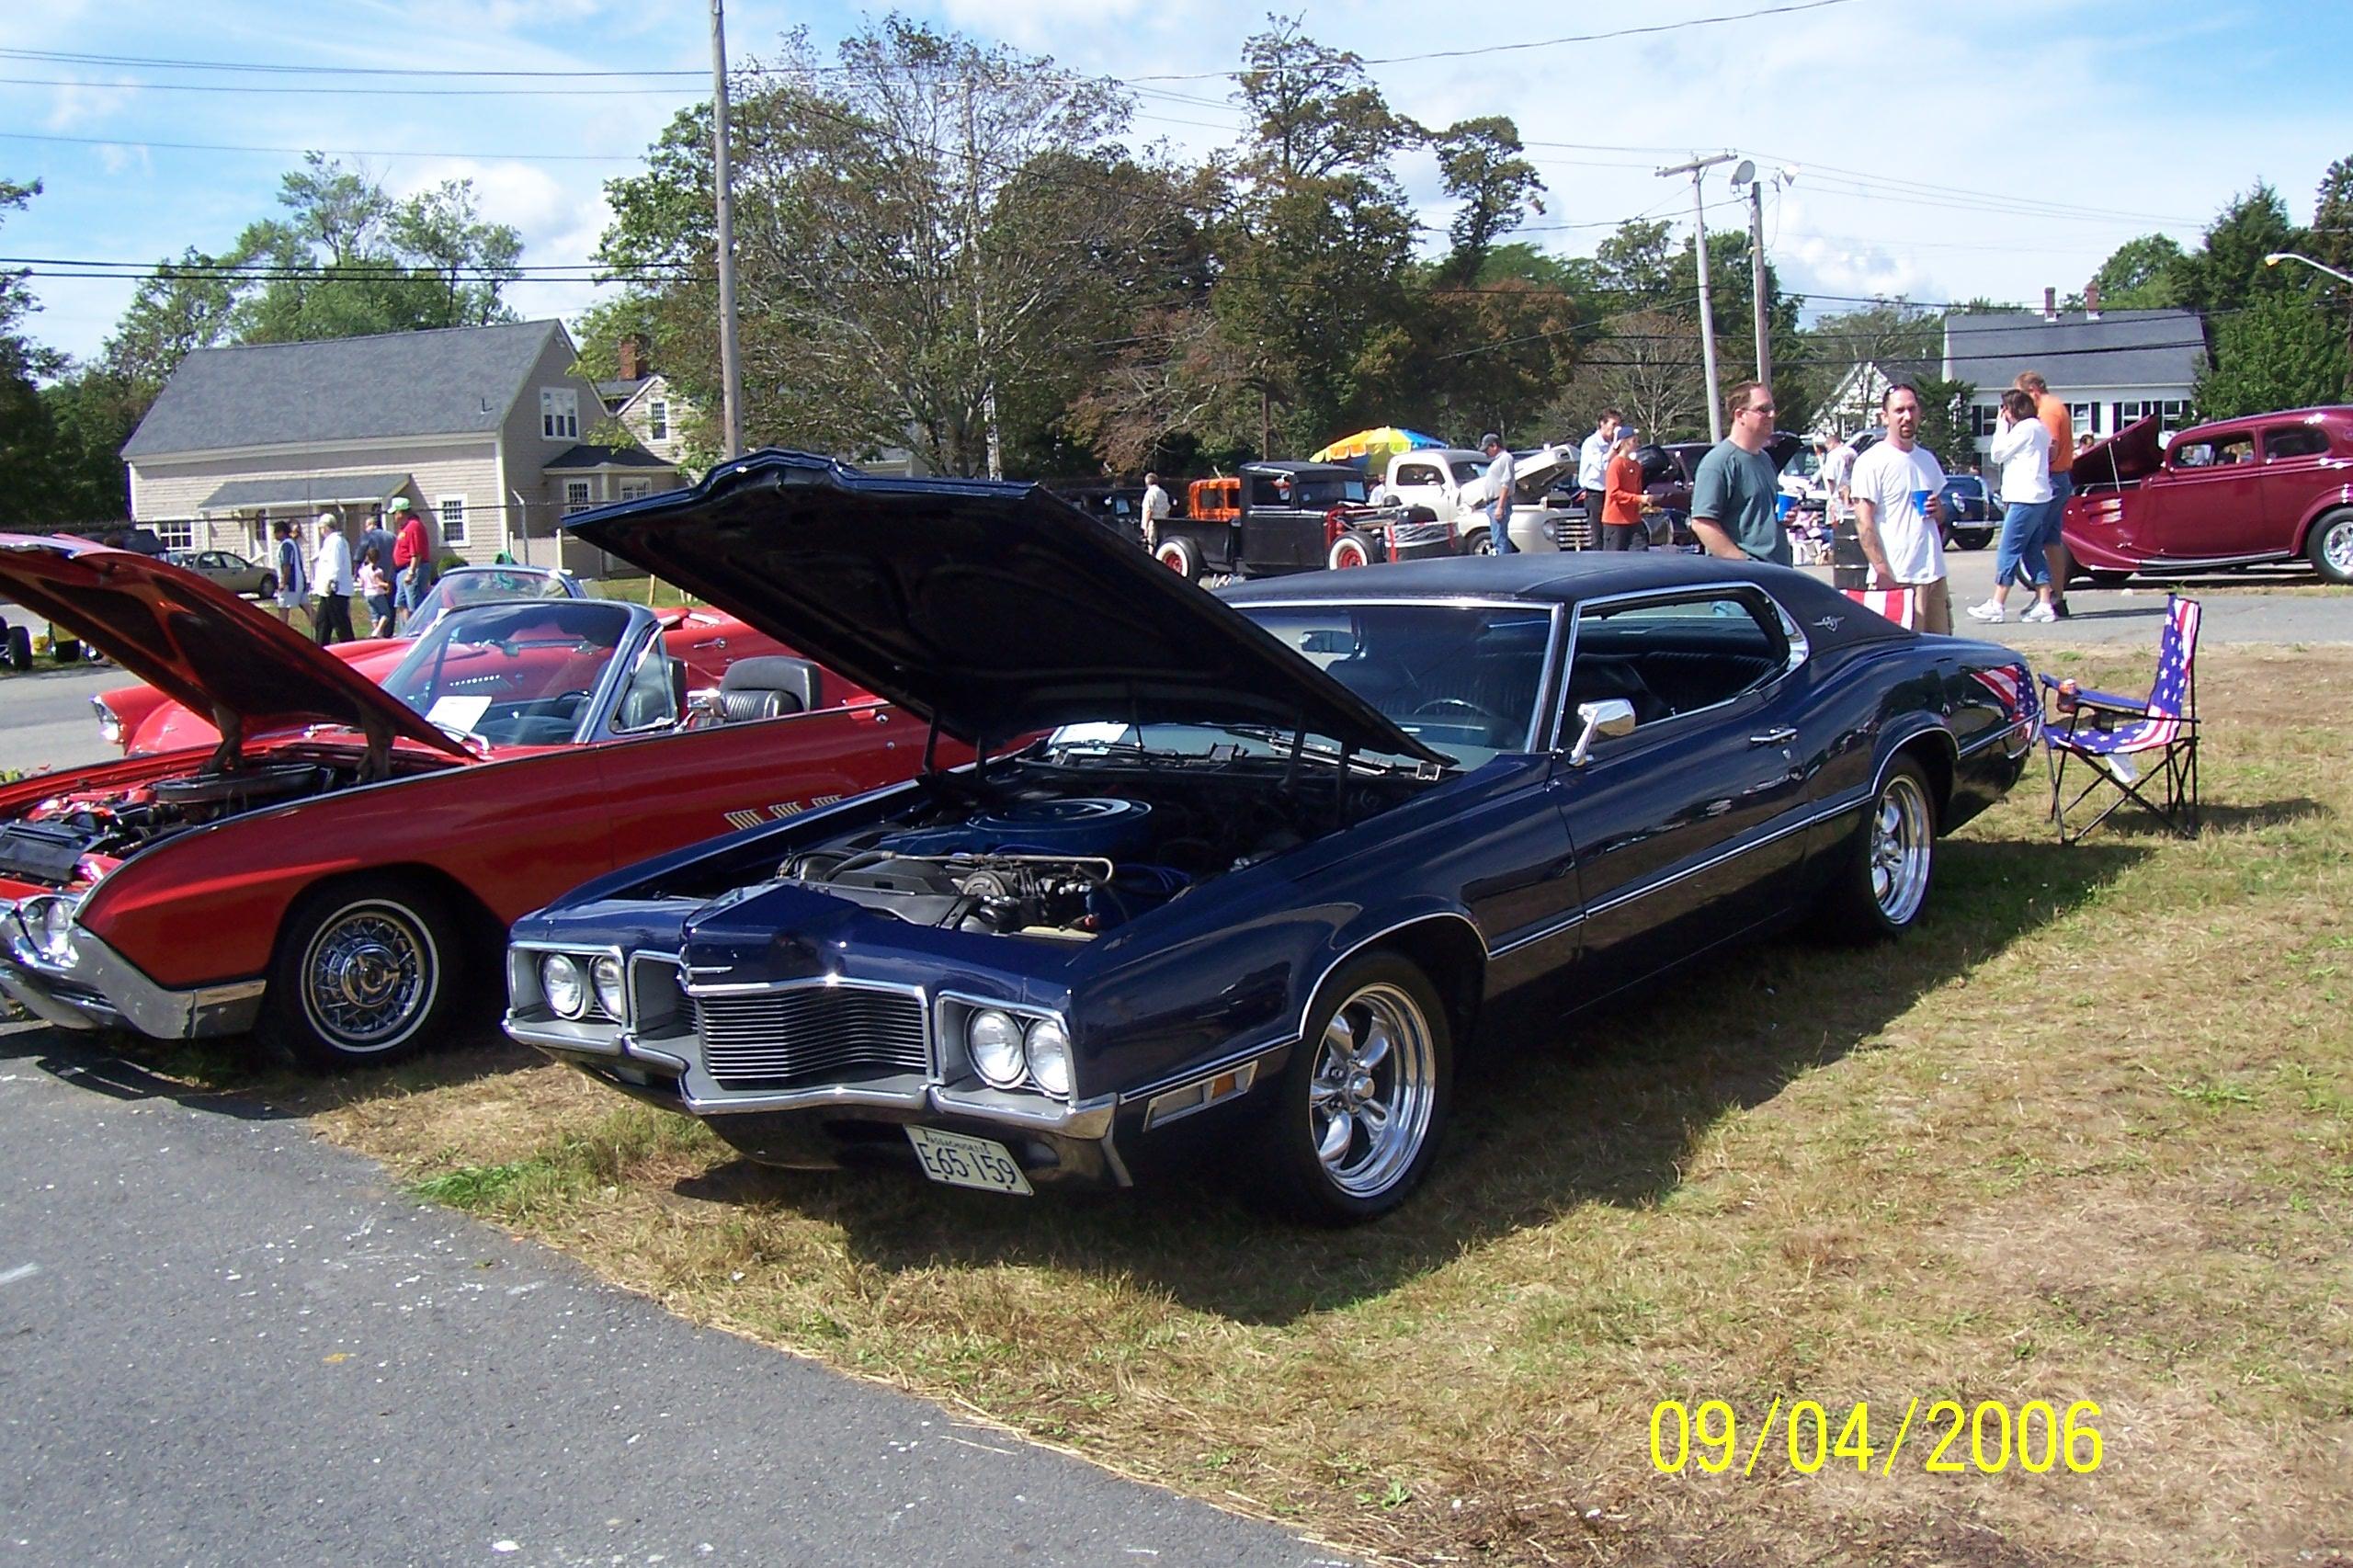 File:1970-1971 Ford Thunderbird.jpg - Wikimedia Commons